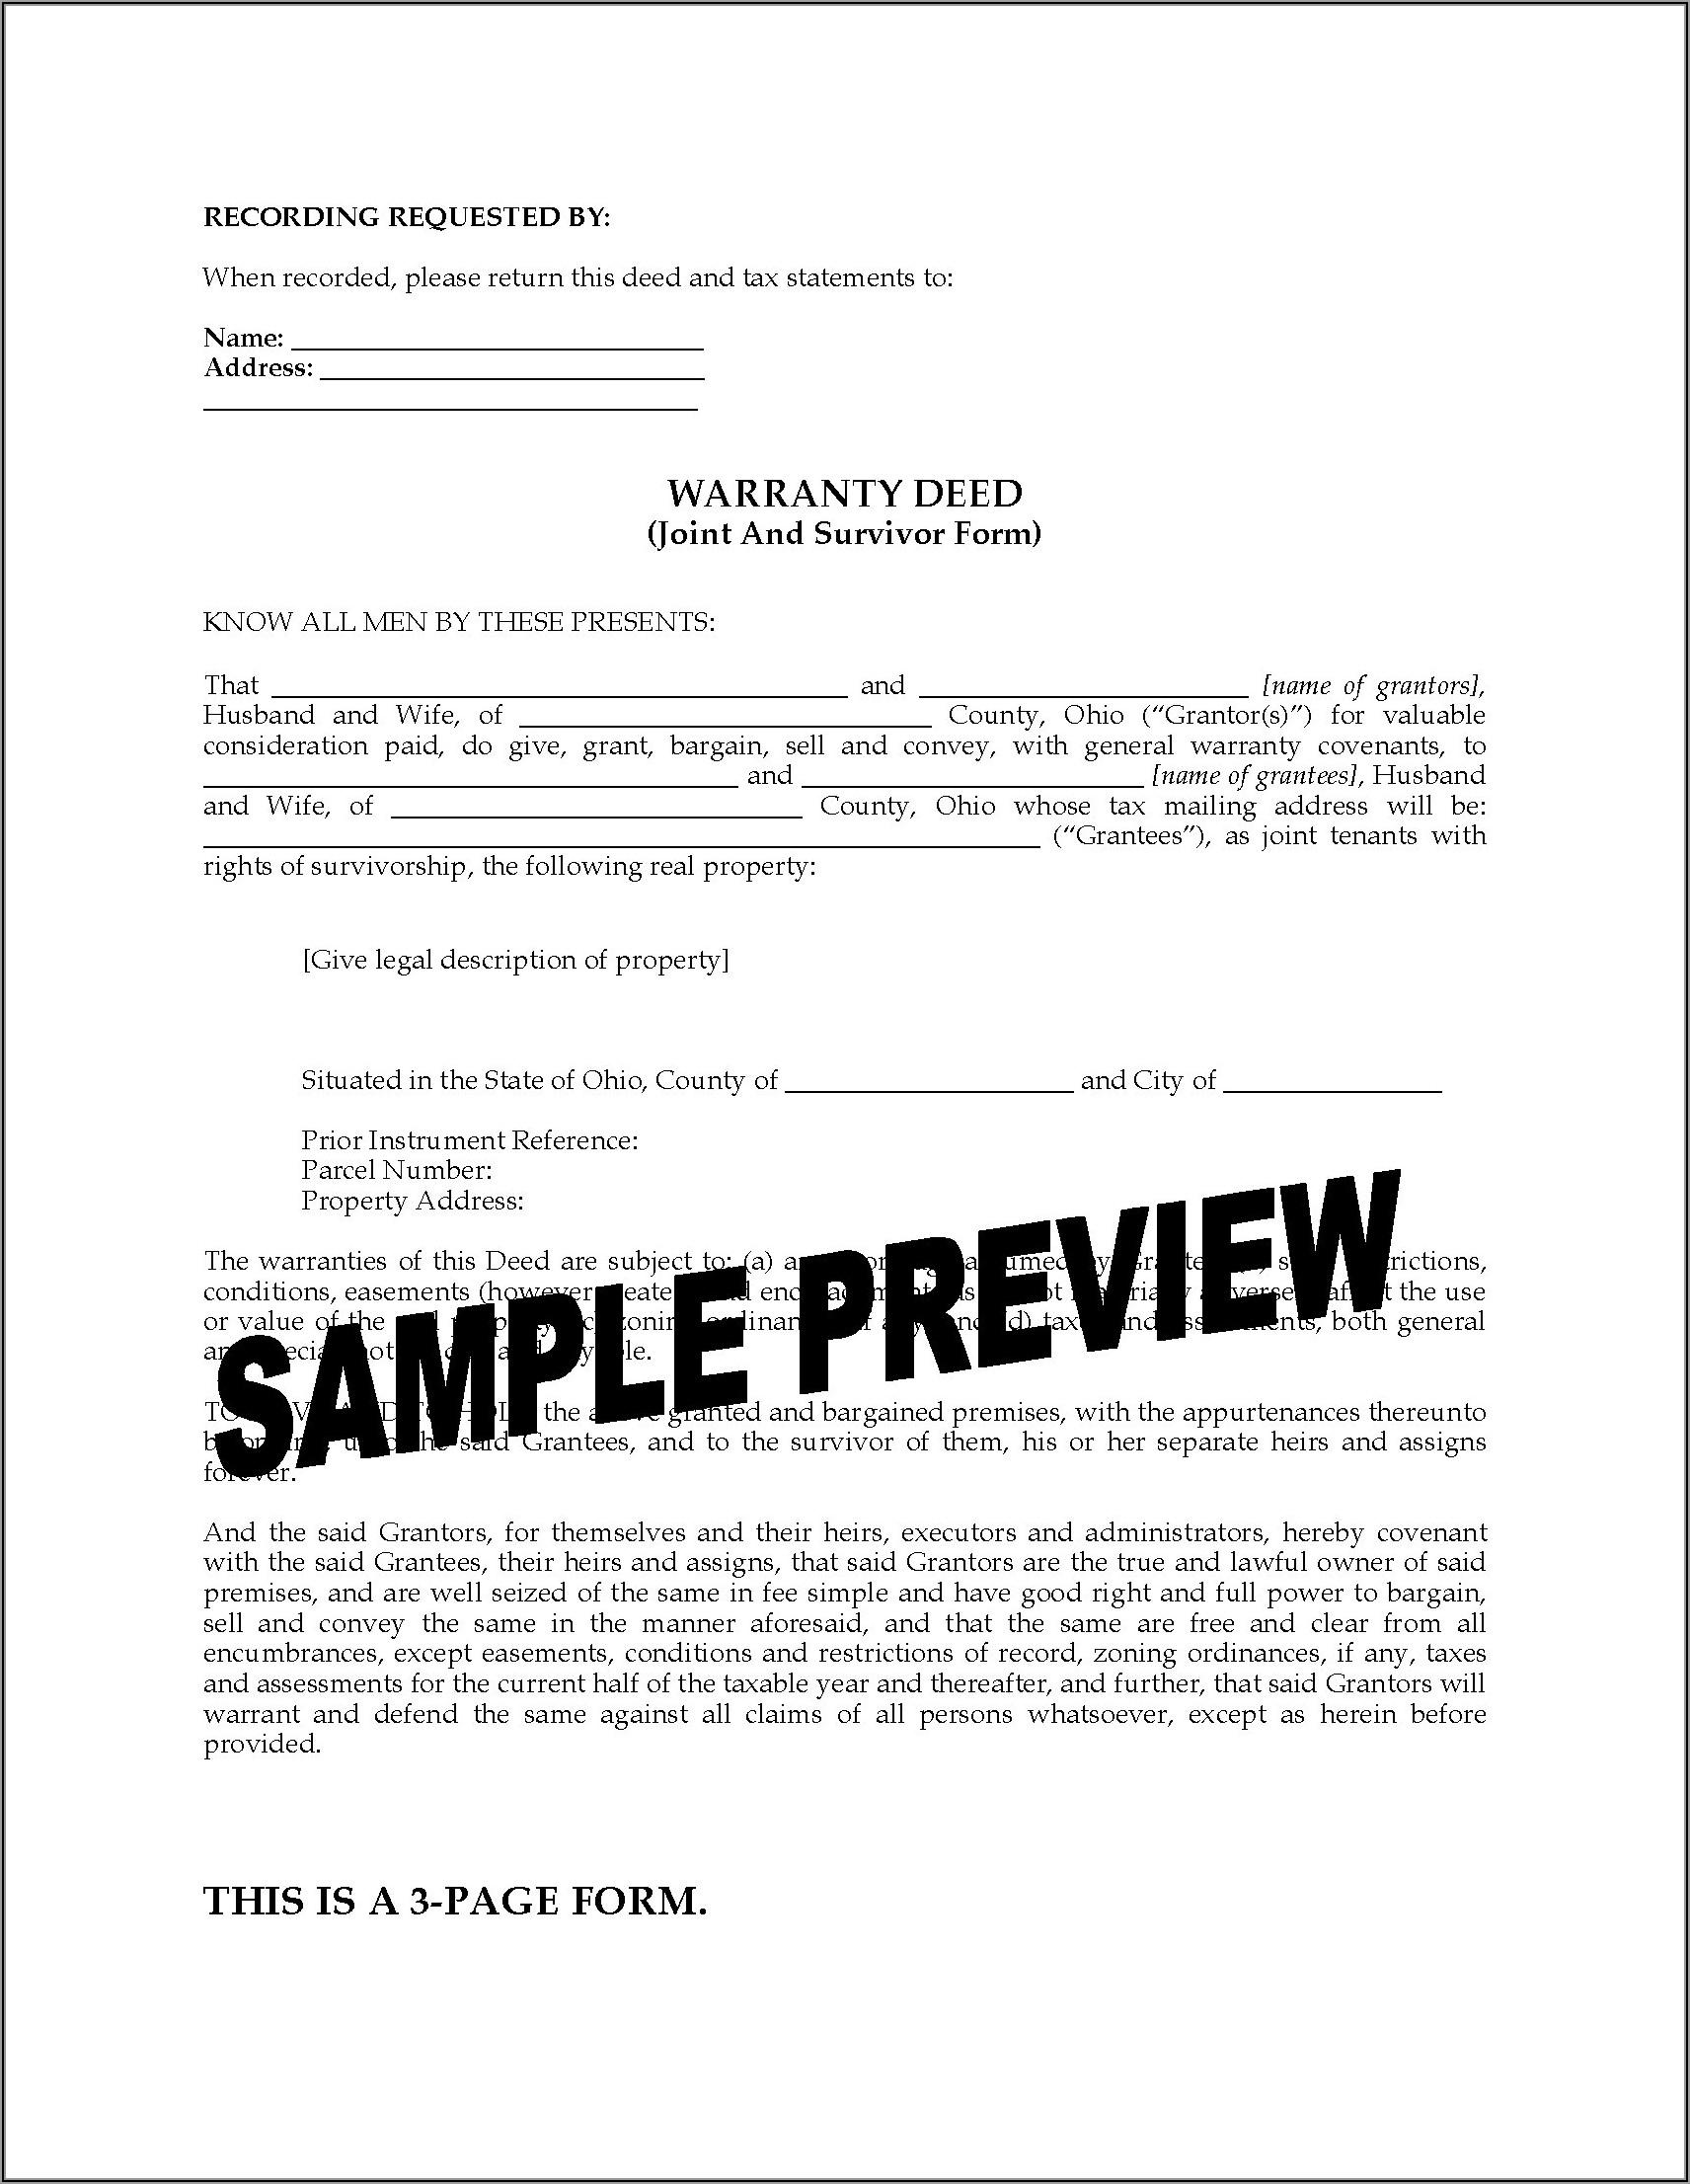 Affidavit Of Survivorship Form Ohio